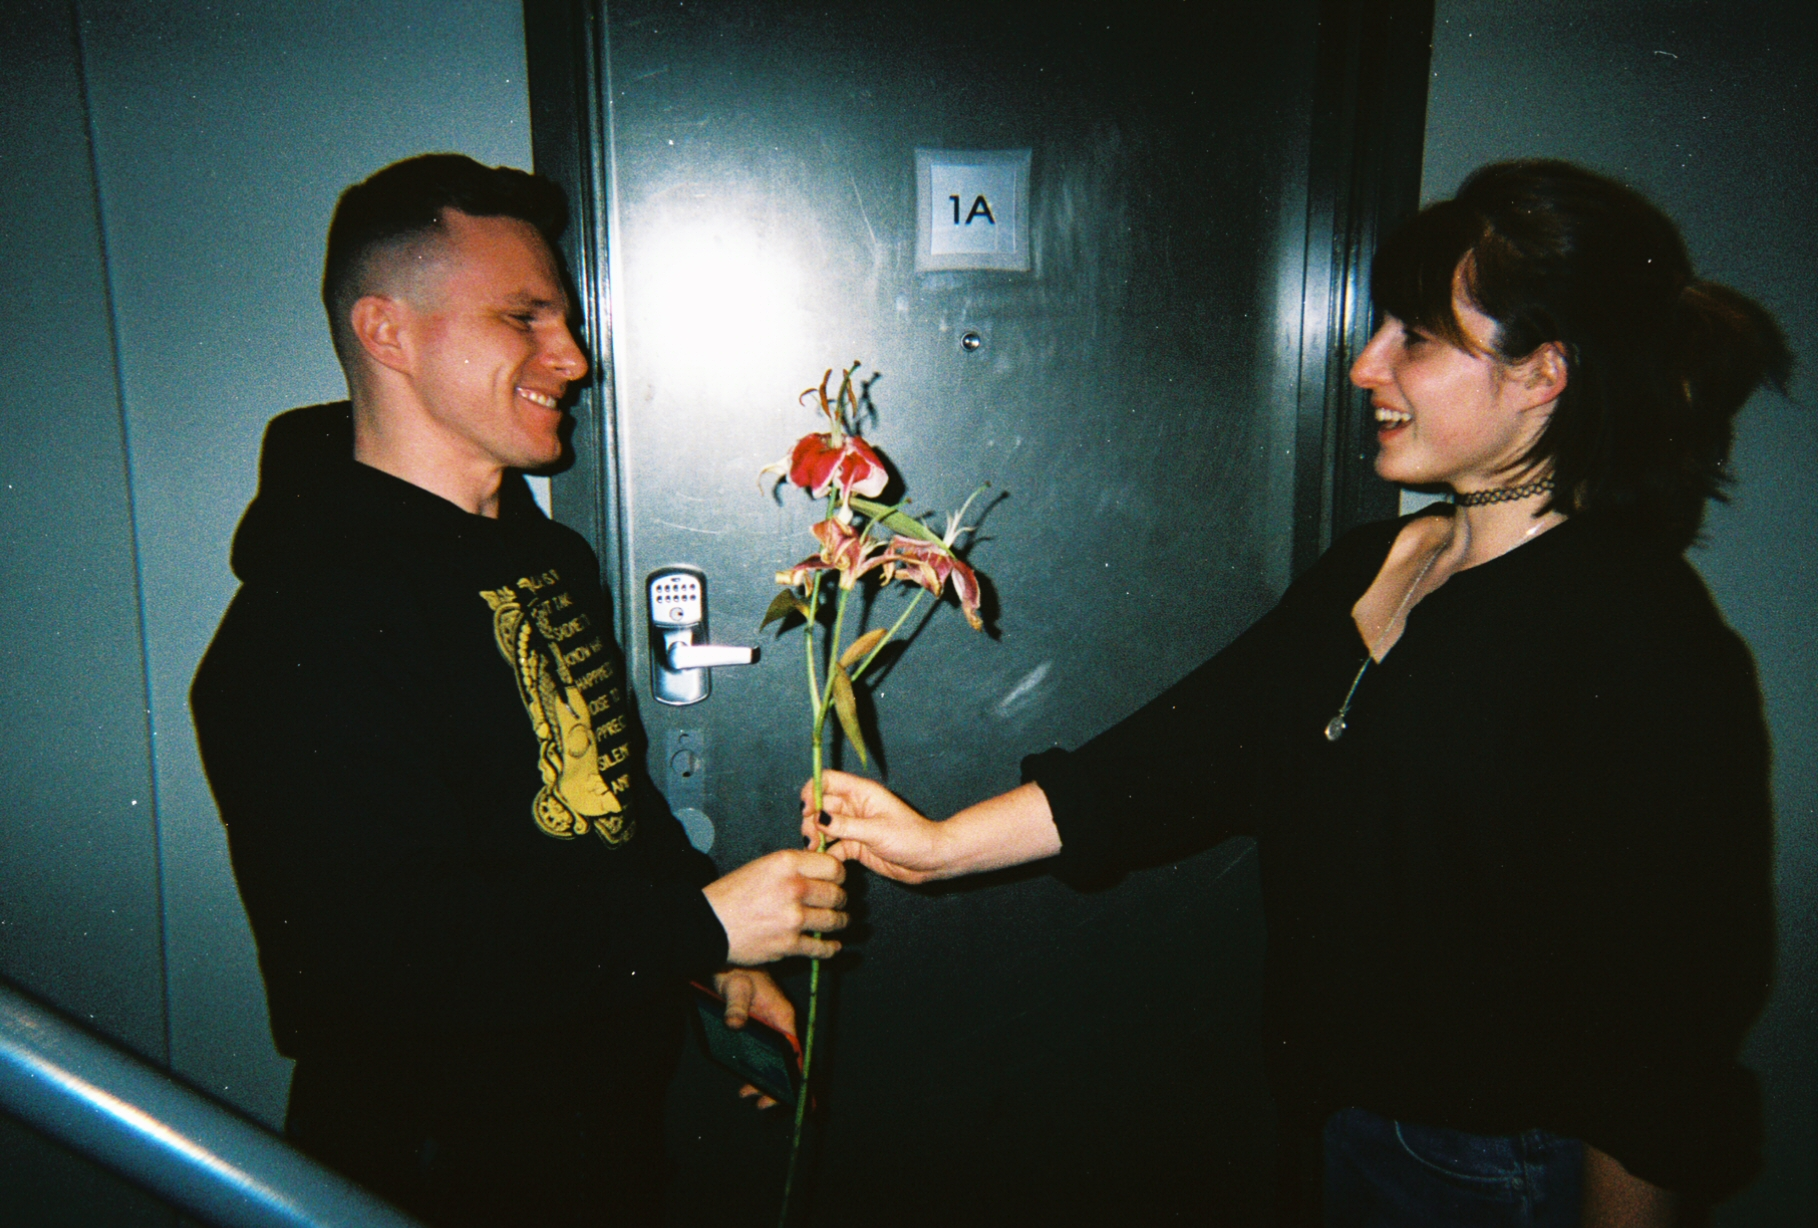 Flower gift to the first stranger